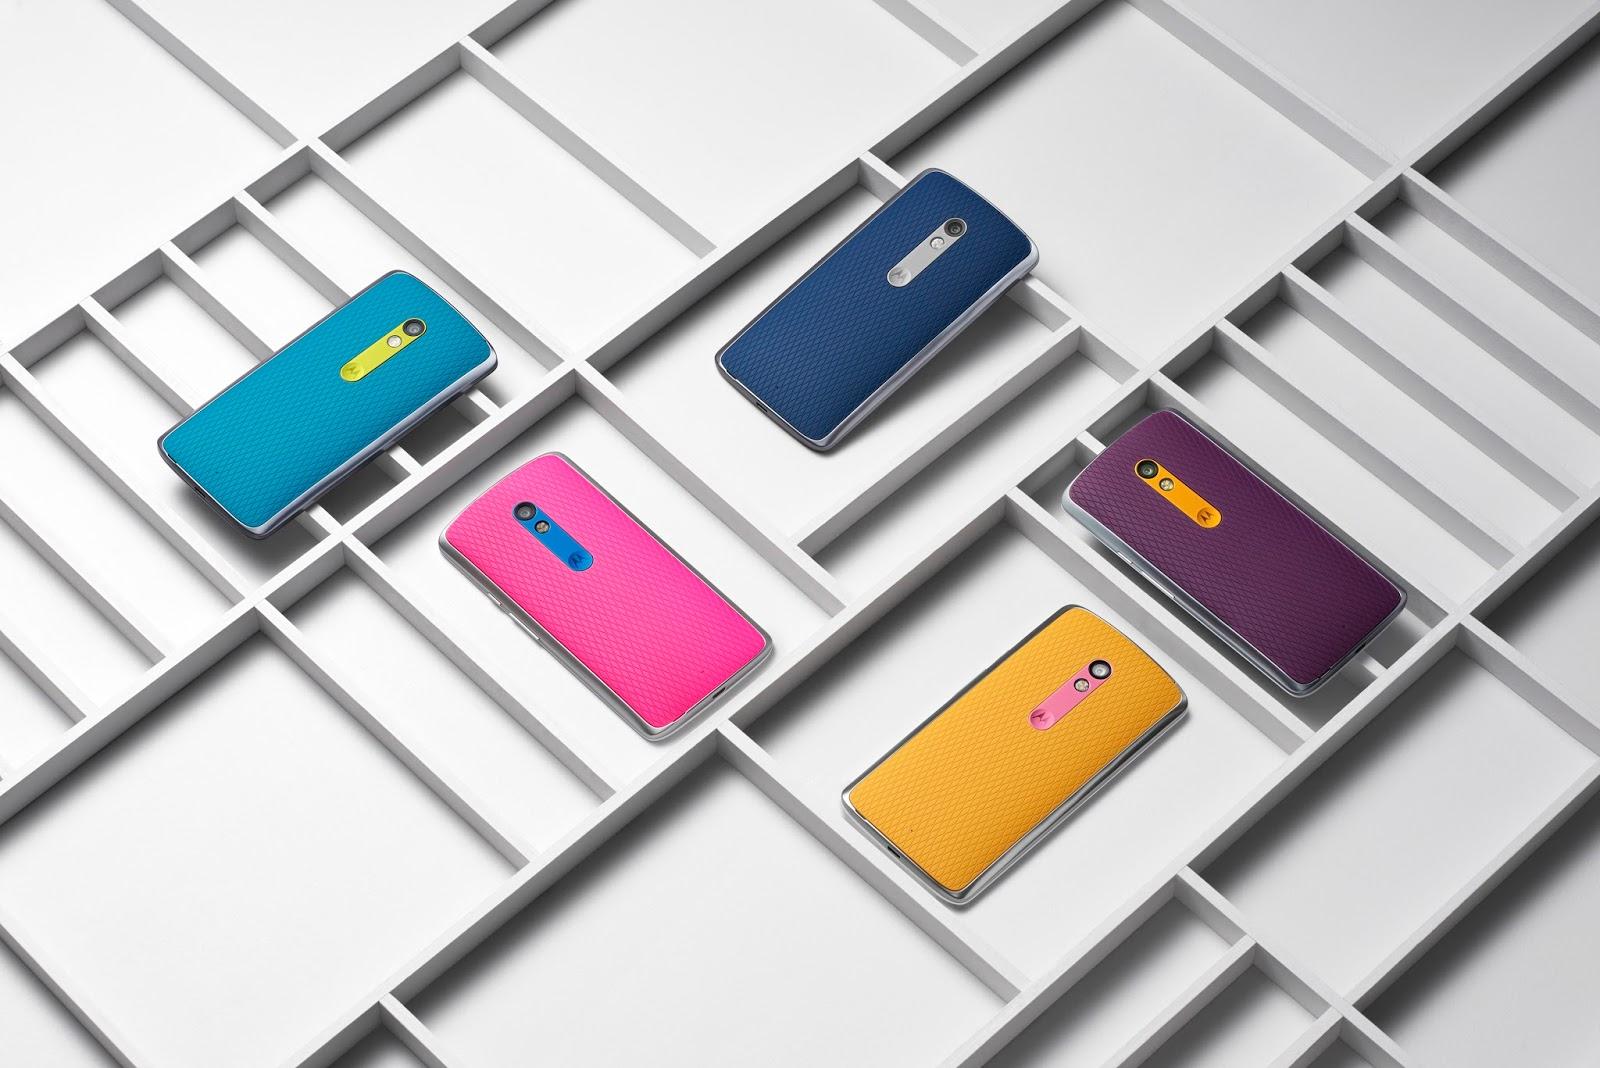 imagens do celular moto x - Moto X (2nd Gen ) Android Smartphone Motorola